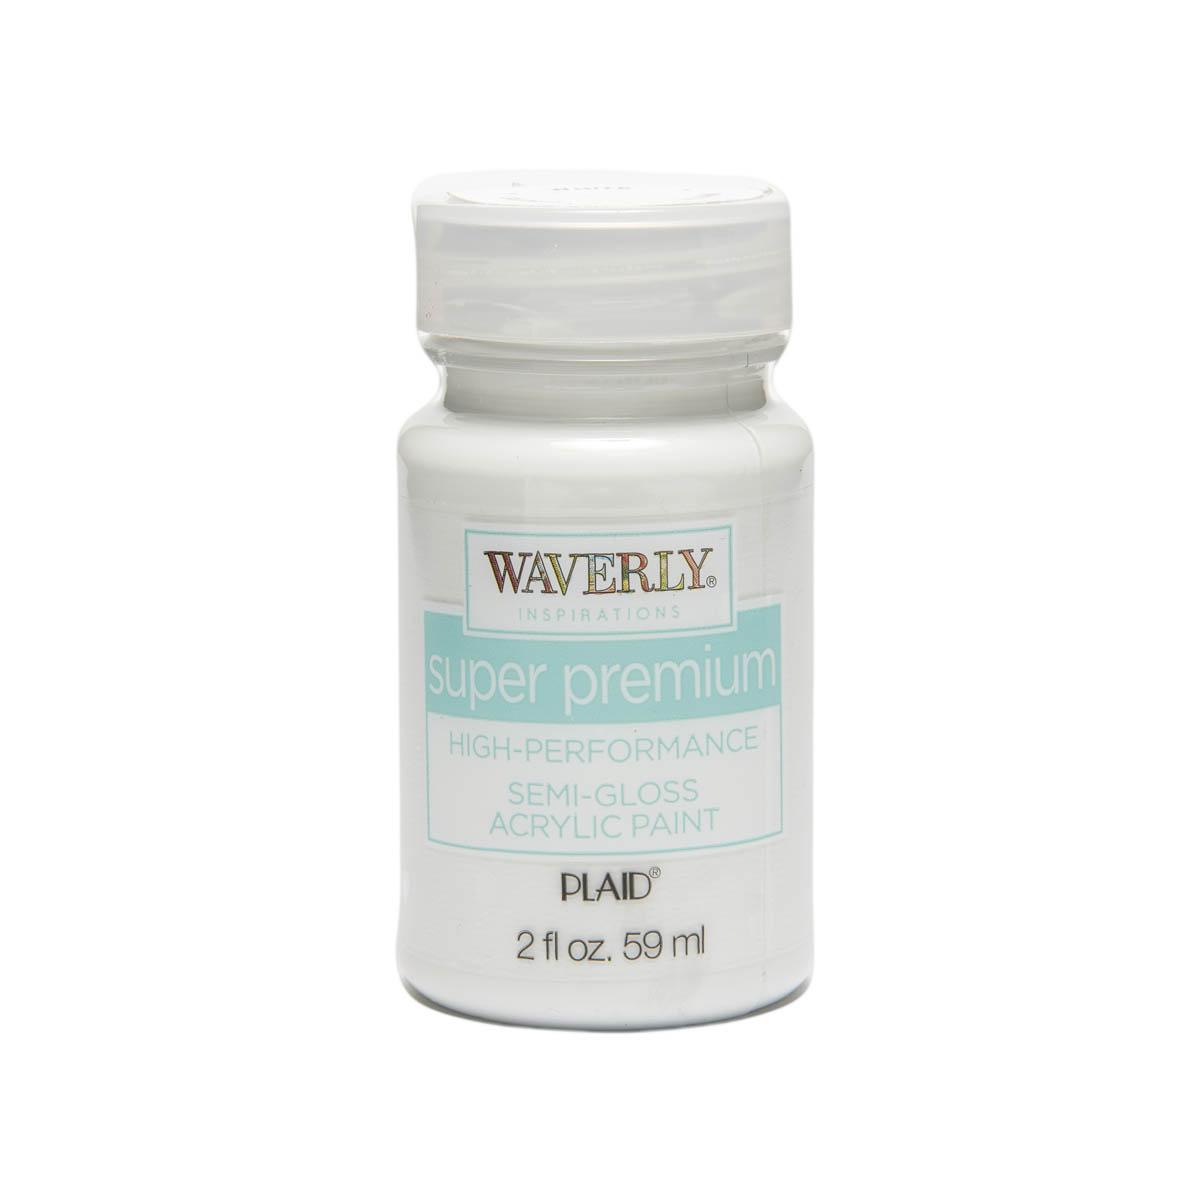 Waverly ® Inspirations Super Premium Semi-Gloss Acrylic Paint - White, 2 oz. - 60598E